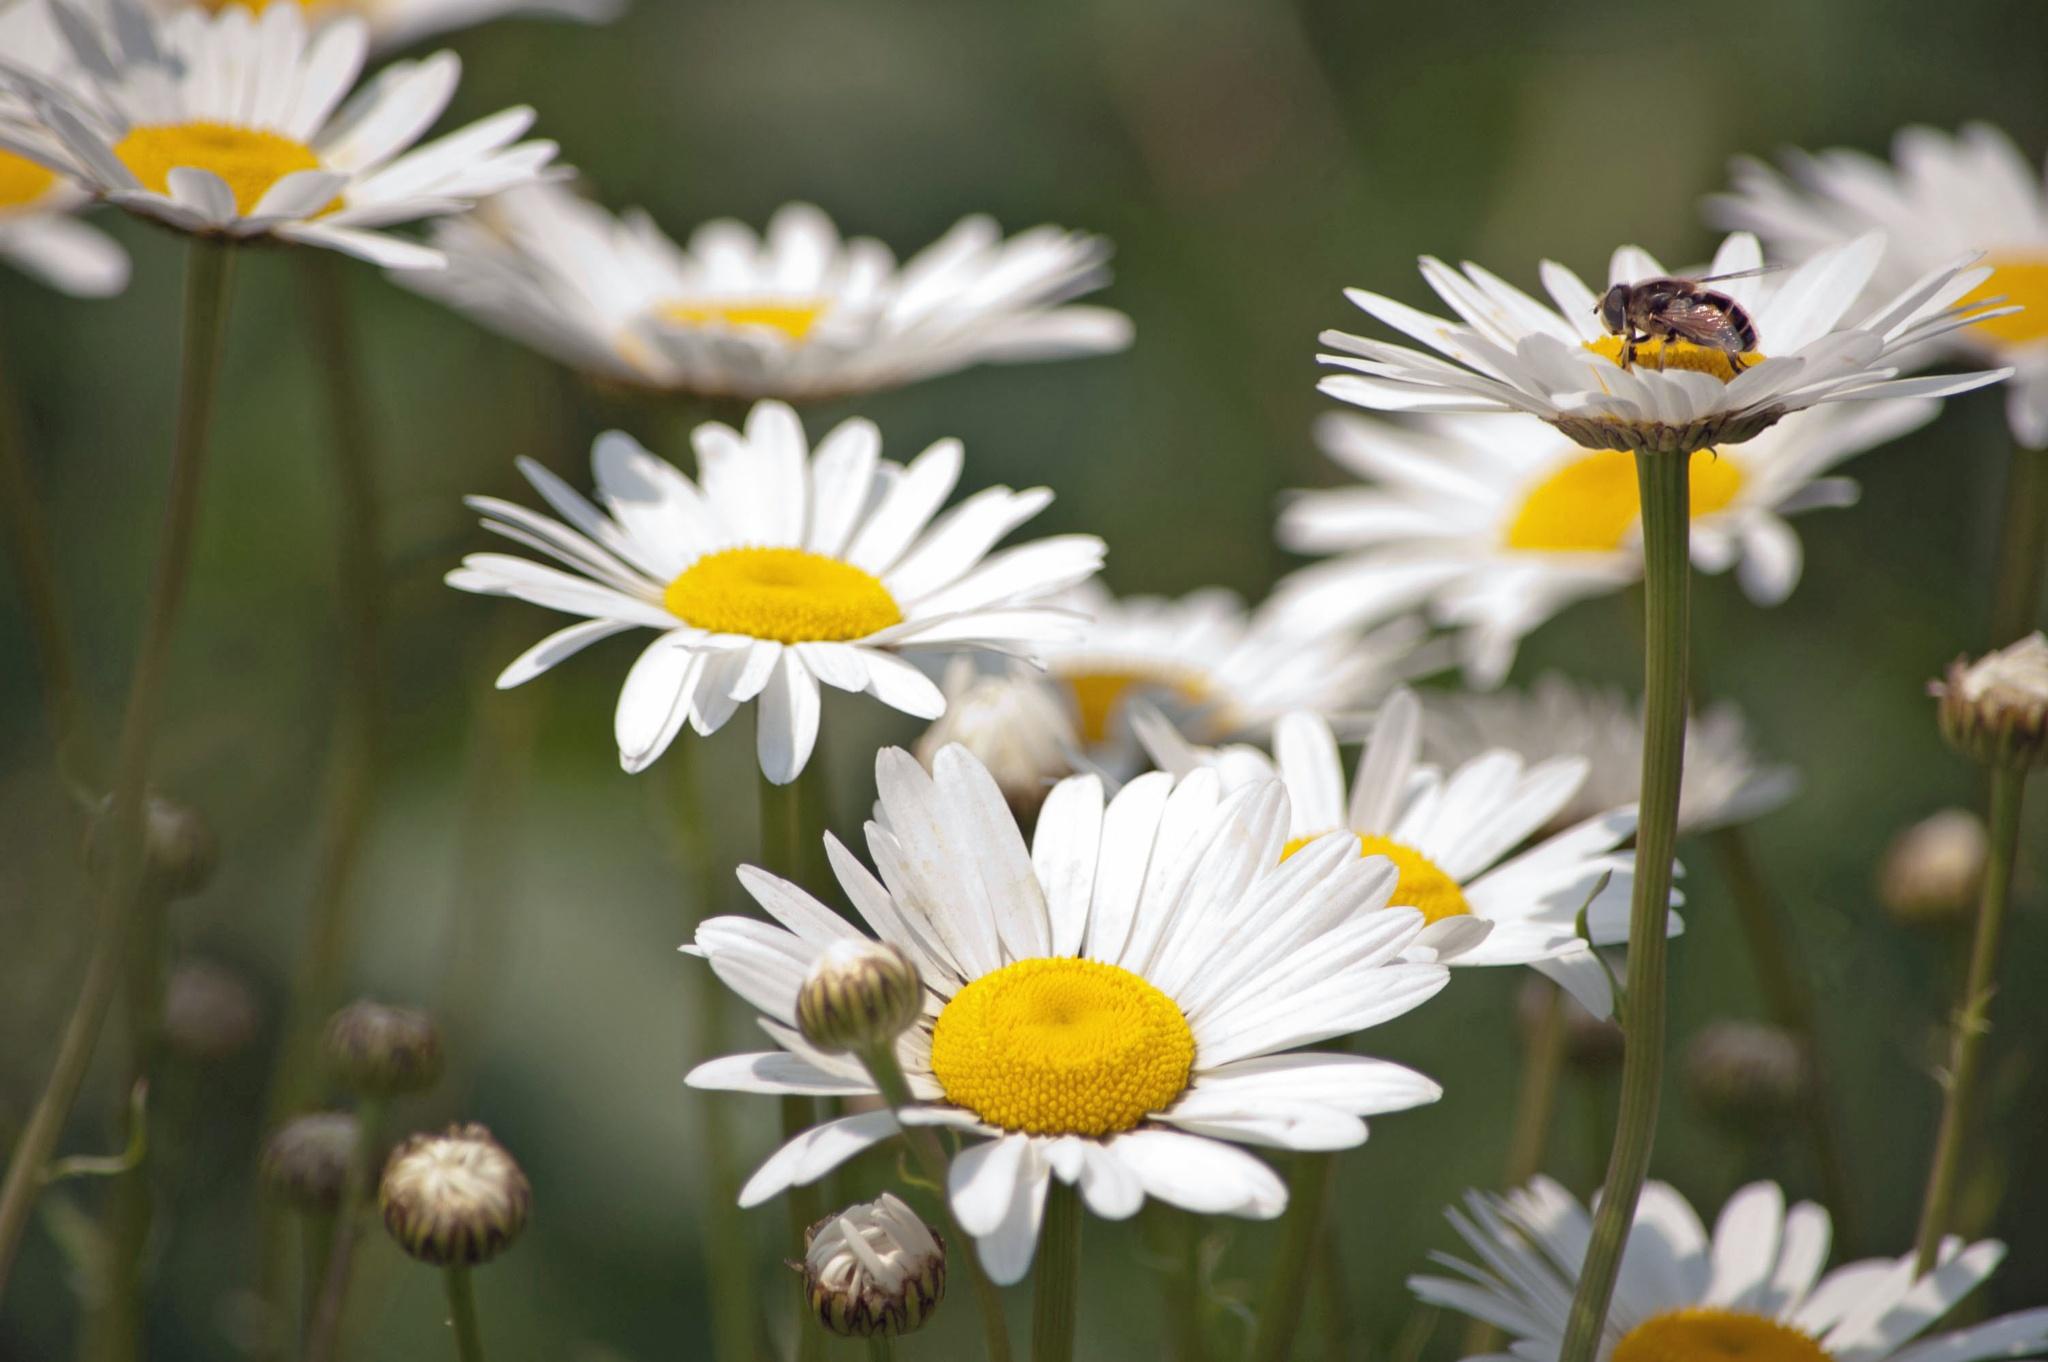 So Many Flowers, So Few Bees by Brady Williams